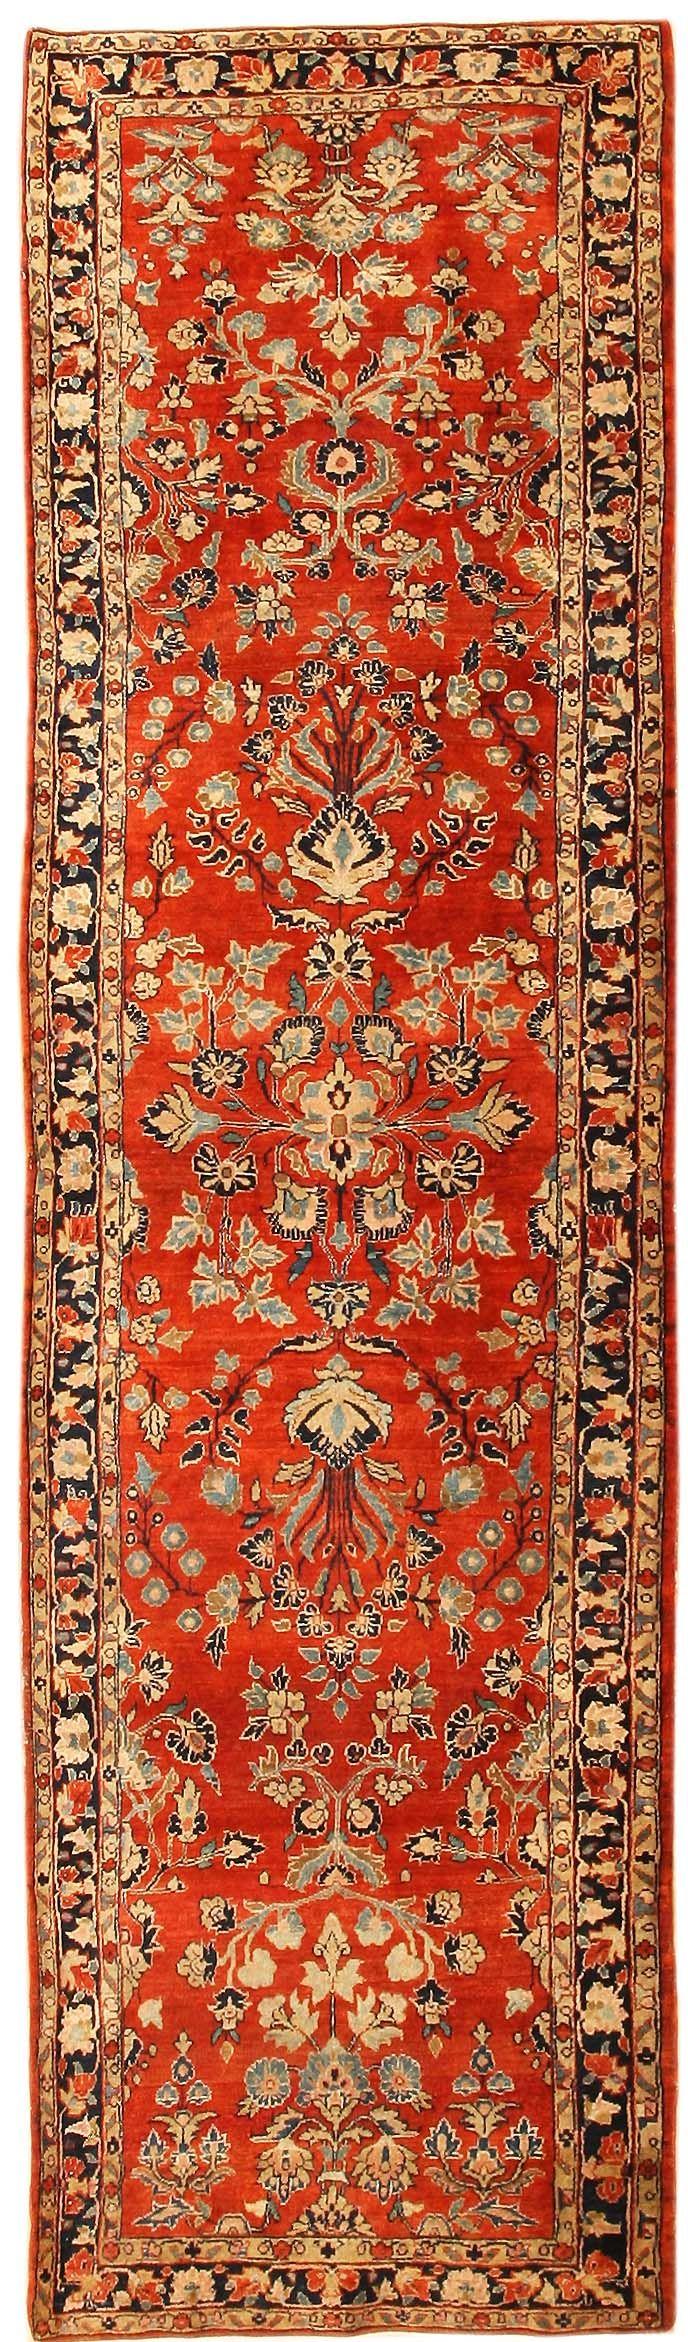 Antique_Sarouk_Persian_Rug_runner_438422.jpg 688×2,342 pixels